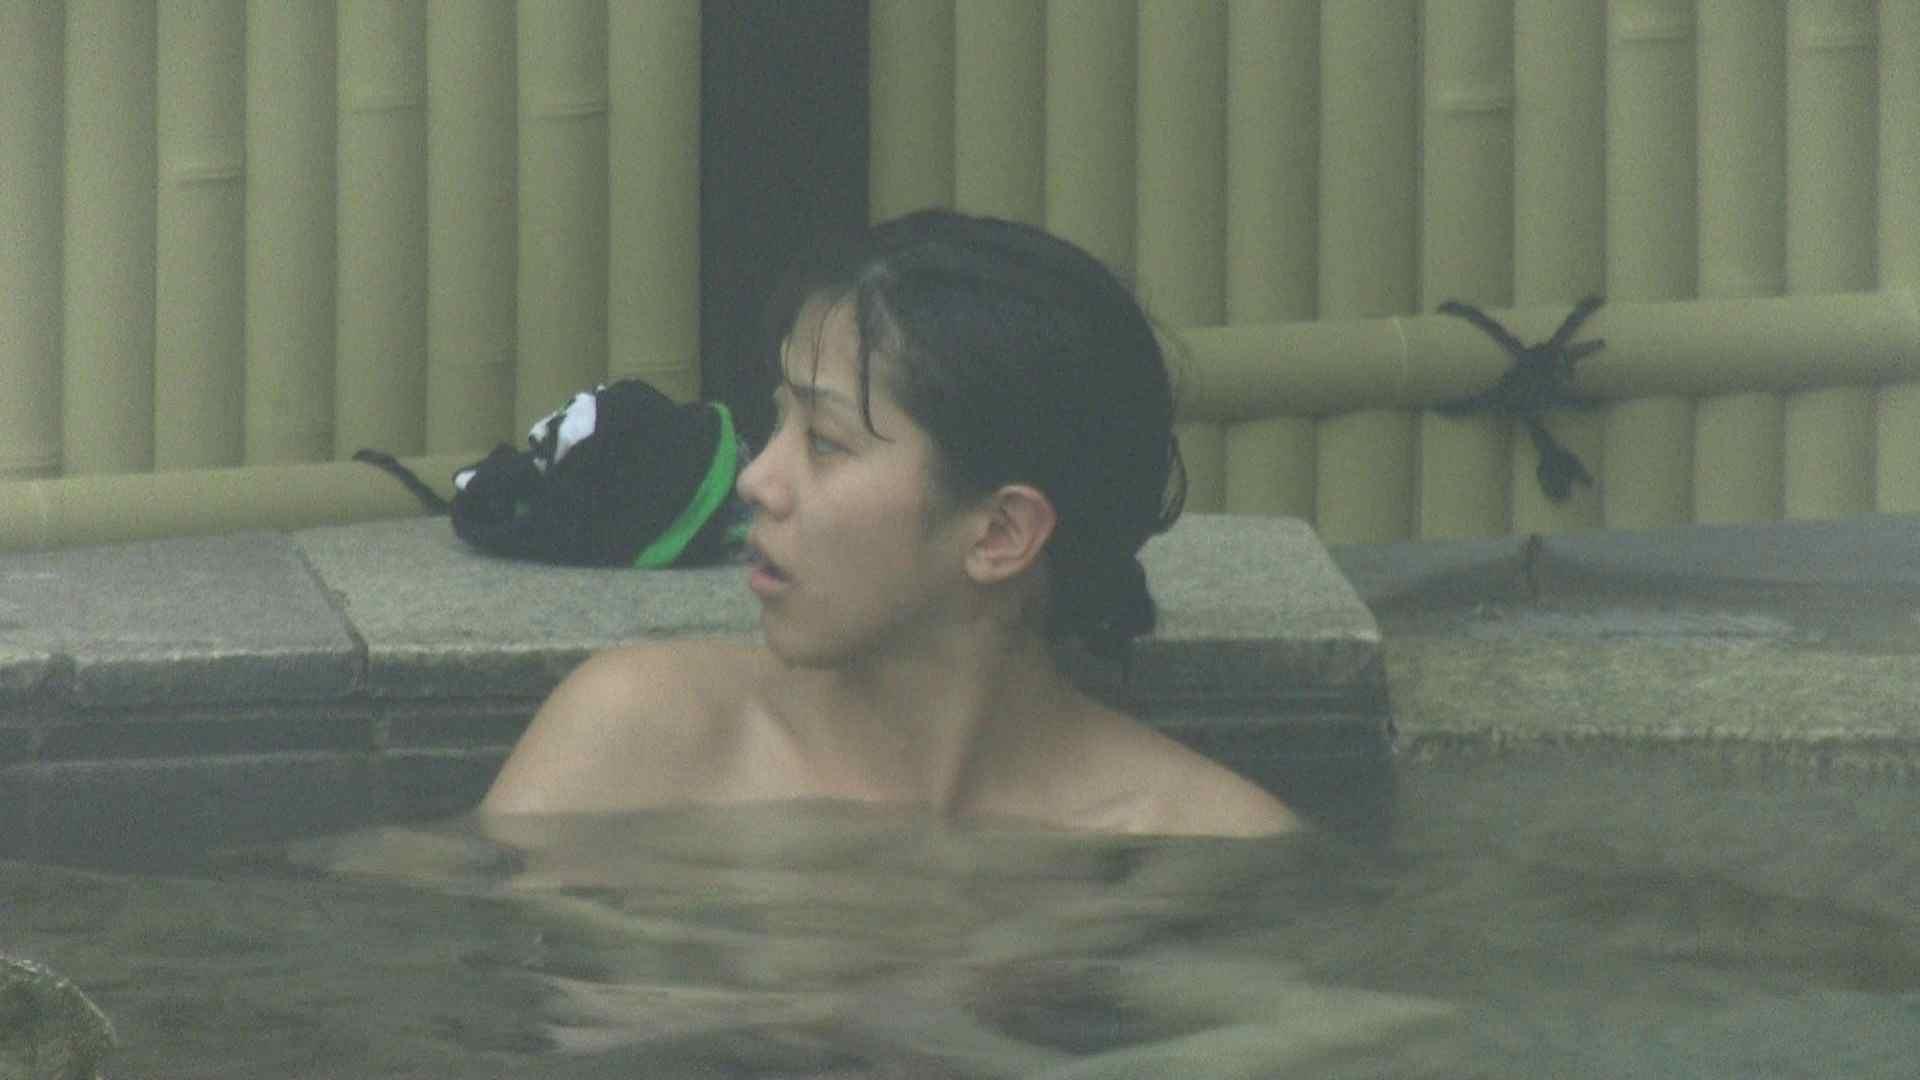 Aquaな露天風呂Vol.174 OLのエロ生活 すけべAV動画紹介 89連発 35